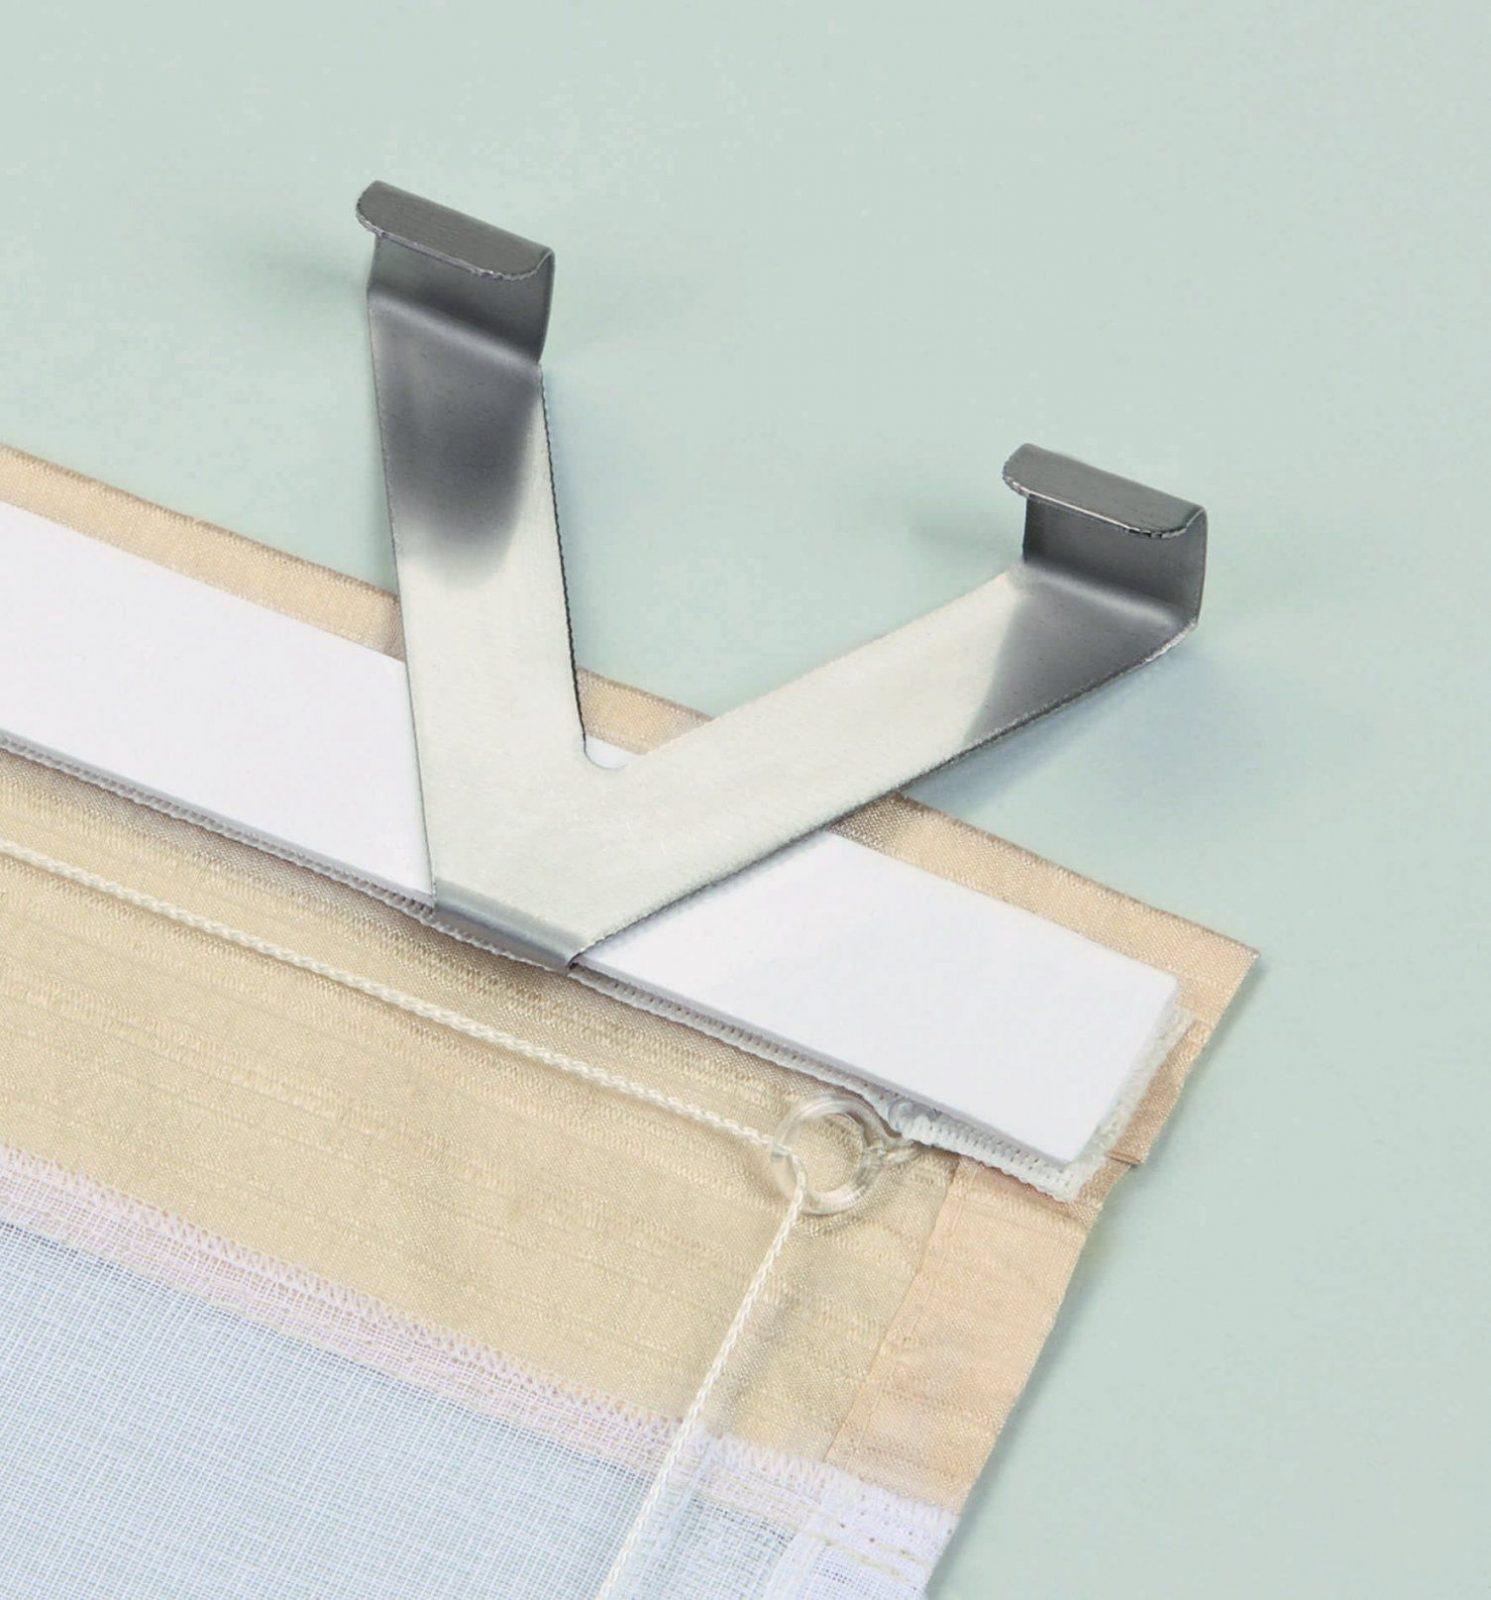 Neu Gardinen Ohne Bohren Ikea Ideen von Scheibengardinen Befestigung Ohne Bohren Bild